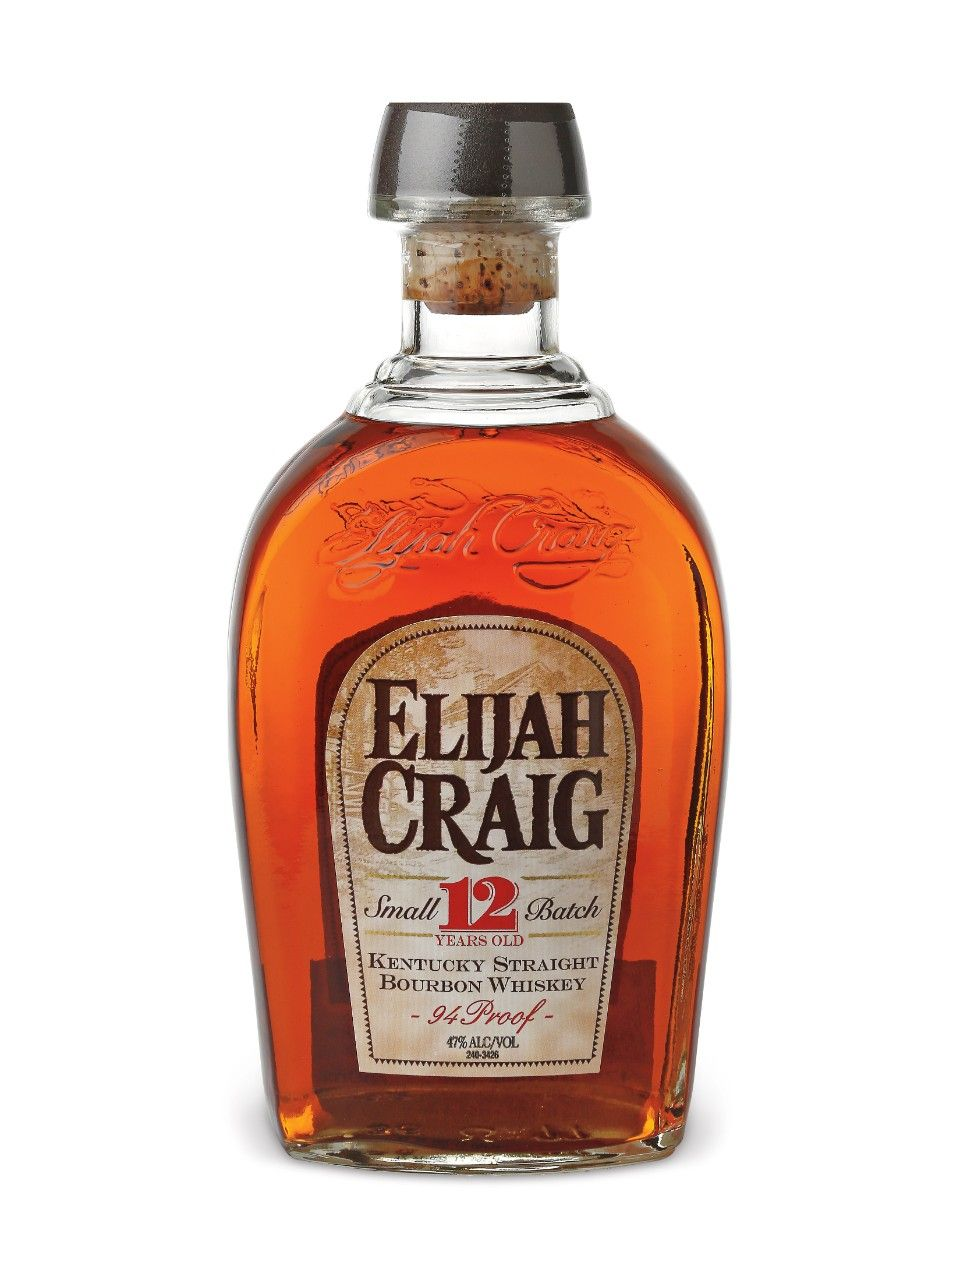 Elijah Craig 12 Years Old Kentucky Straight Bourbon Bourbon Kentucky Straight Bourbon Bourbon Straight